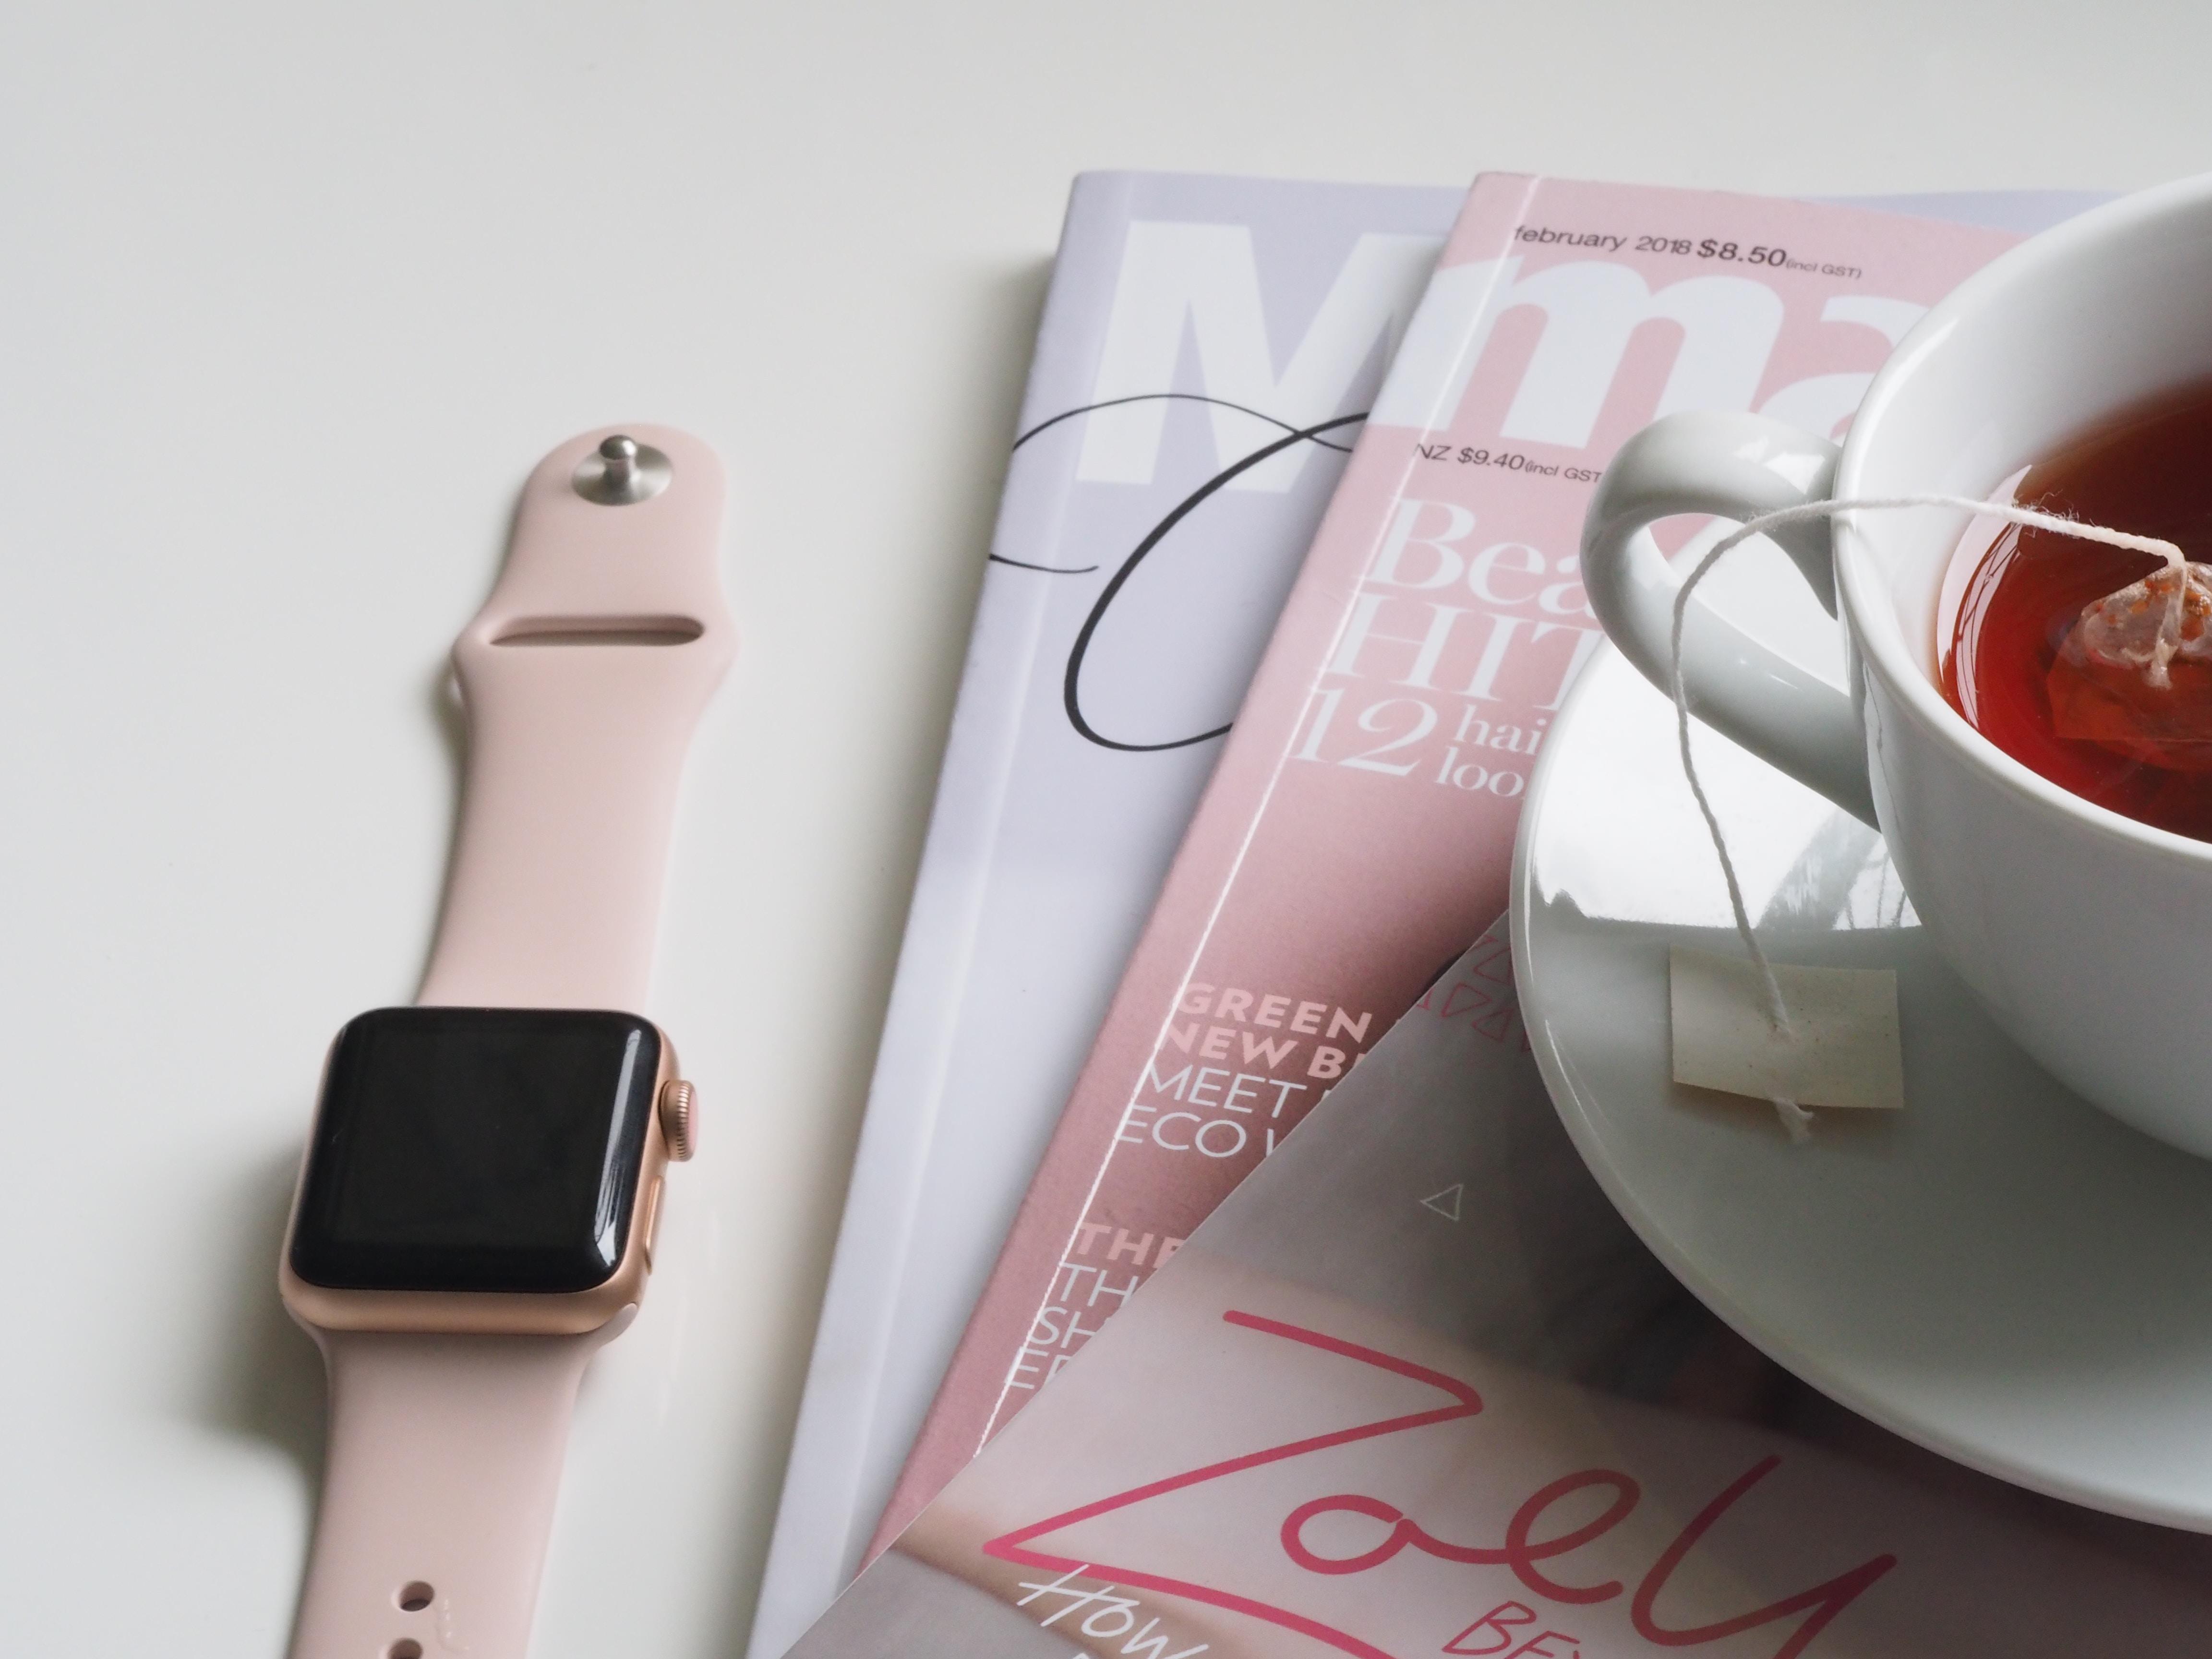 smartwatch near three books